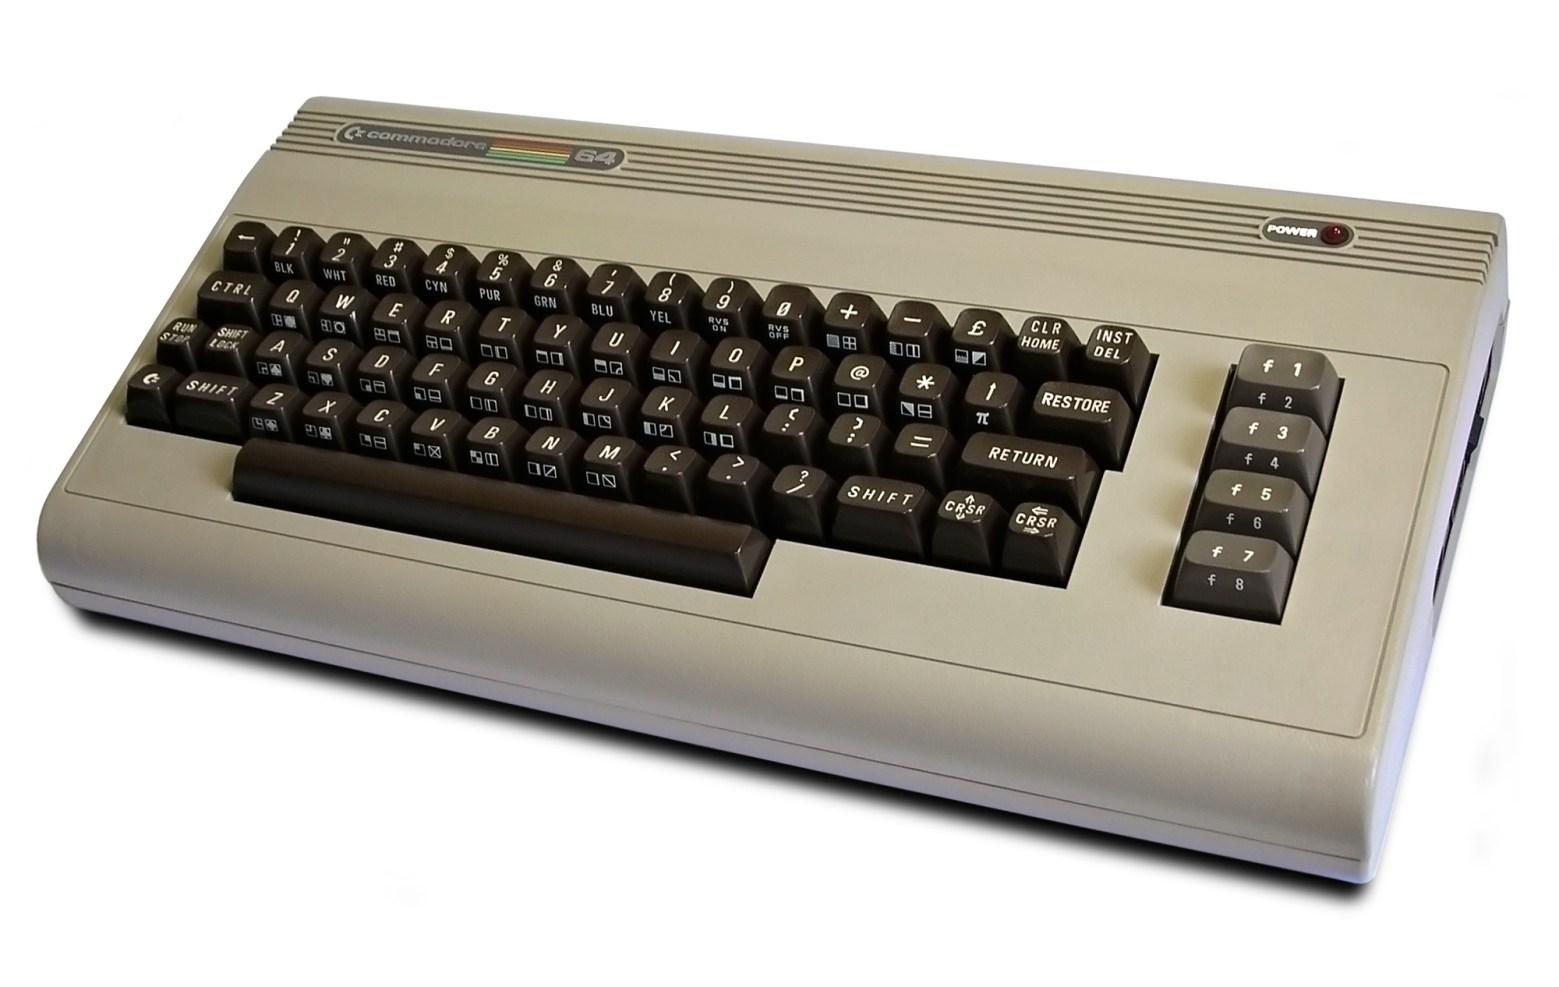 Uribe Schwarzkopf- uSpots- Commodore